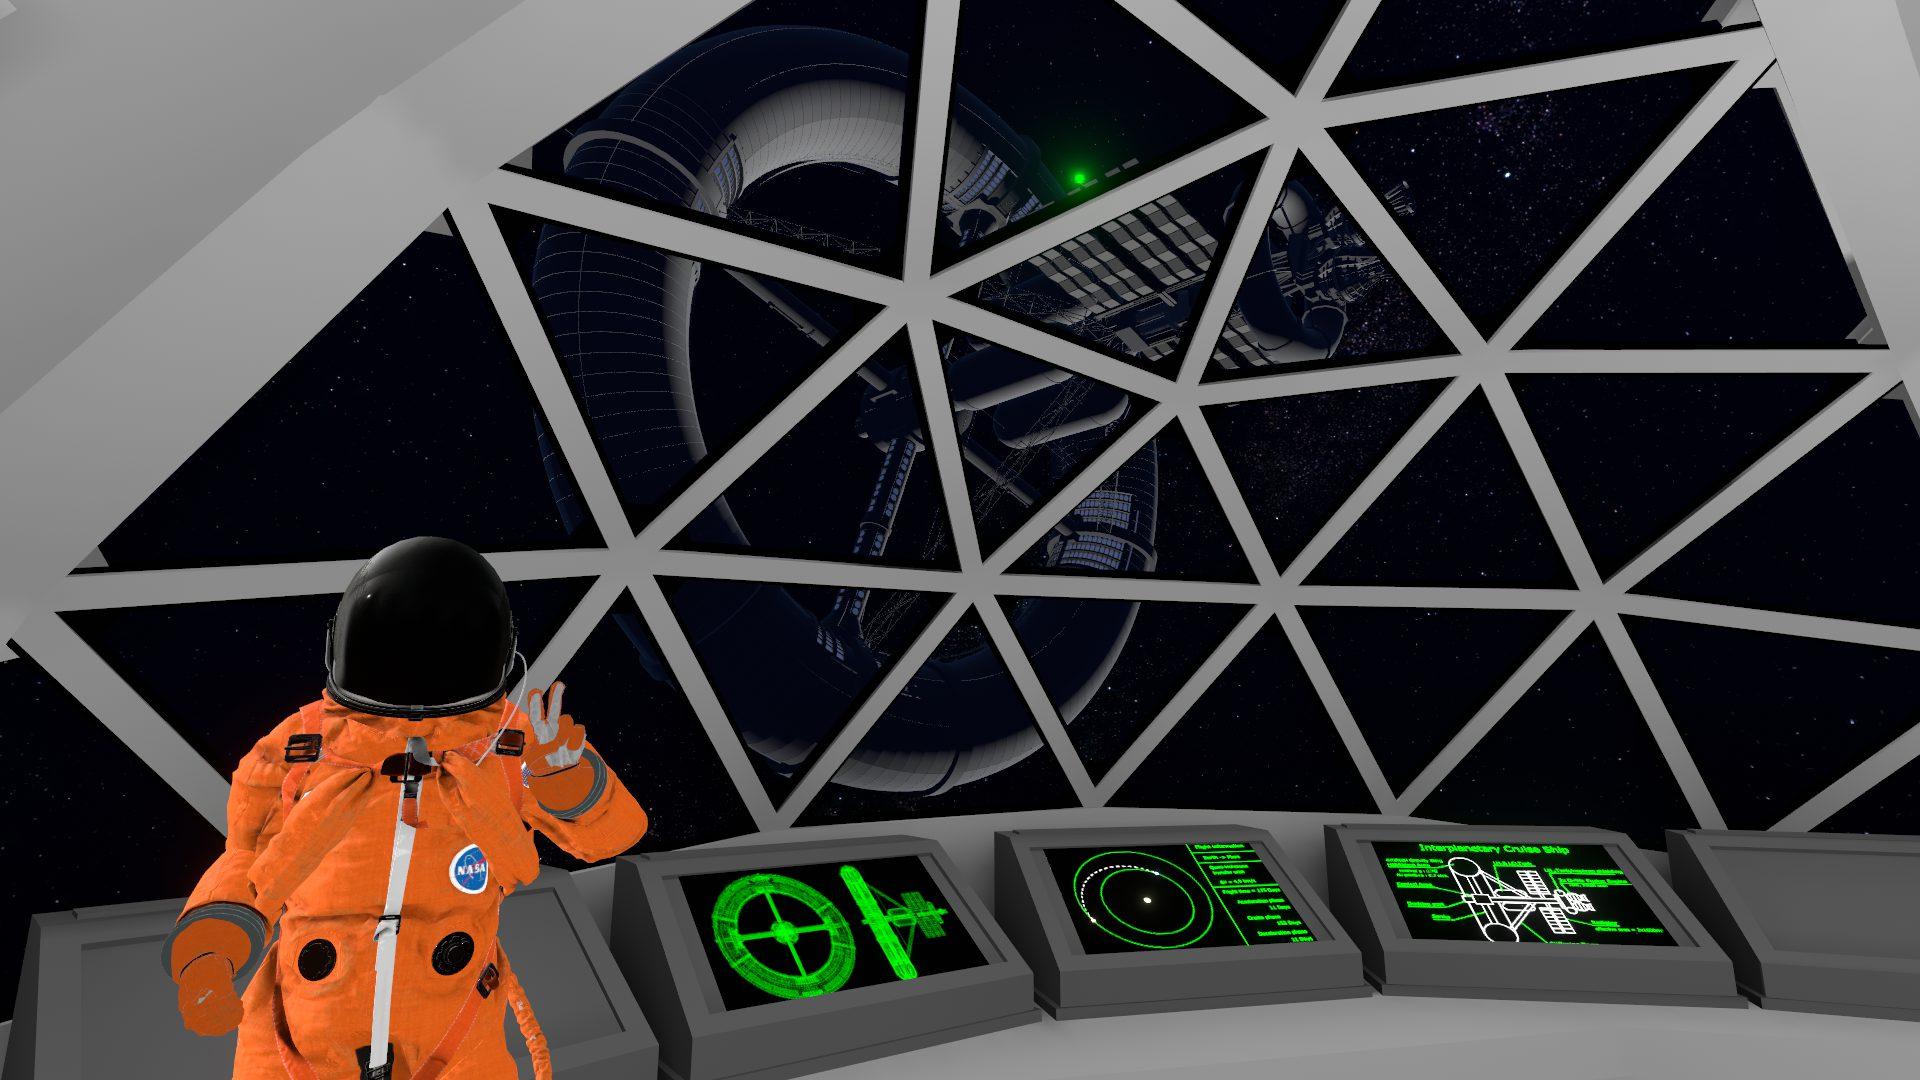 Interplanetary Cruise Ship — by S_ASAGIRI